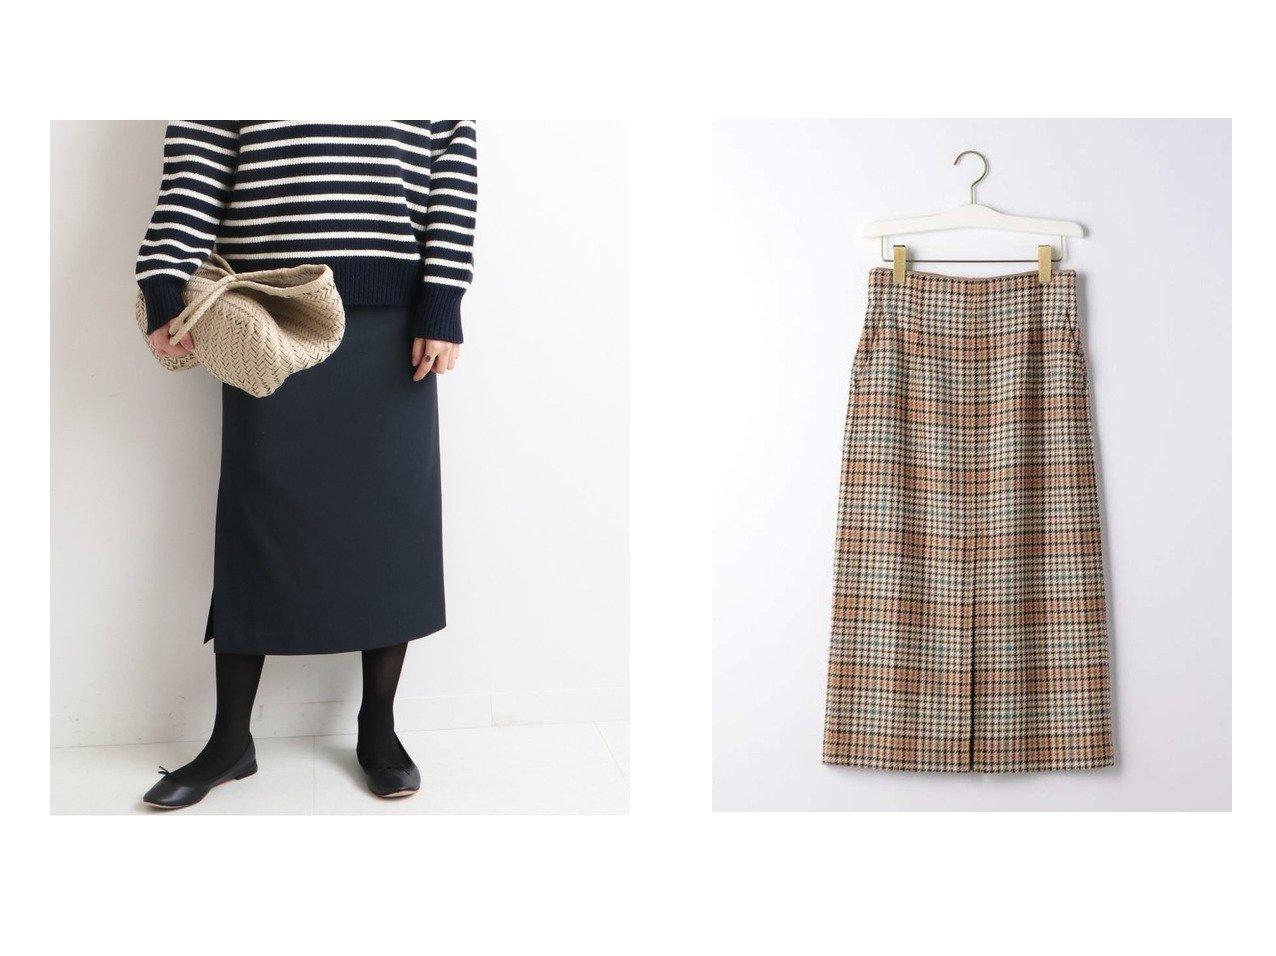 【green label relaxing / UNITED ARROWS/グリーンレーベル リラクシング / ユナイテッドアローズ】の【EMMEL REFINES】EM バリチェック スカート1&【IENA/イエナ】のスリットタイトスカート スカートのおすすめ!人気、トレンド・レディースファッションの通販 おすすめで人気の流行・トレンド、ファッションの通販商品 メンズファッション・キッズファッション・インテリア・家具・レディースファッション・服の通販 founy(ファニー) https://founy.com/ ファッション Fashion レディースファッション WOMEN スカート Skirt タイトスカート チェック フロント ボックス A/W 秋冬 AW Autumn/Winter / FW Fall-Winter NEW・新作・新着・新入荷 New Arrivals 2020年 2020 2020-2021 秋冬 A/W AW Autumn/Winter / FW Fall-Winter 2020-2021 シンプル 人気 無地 |ID:crp329100000014437